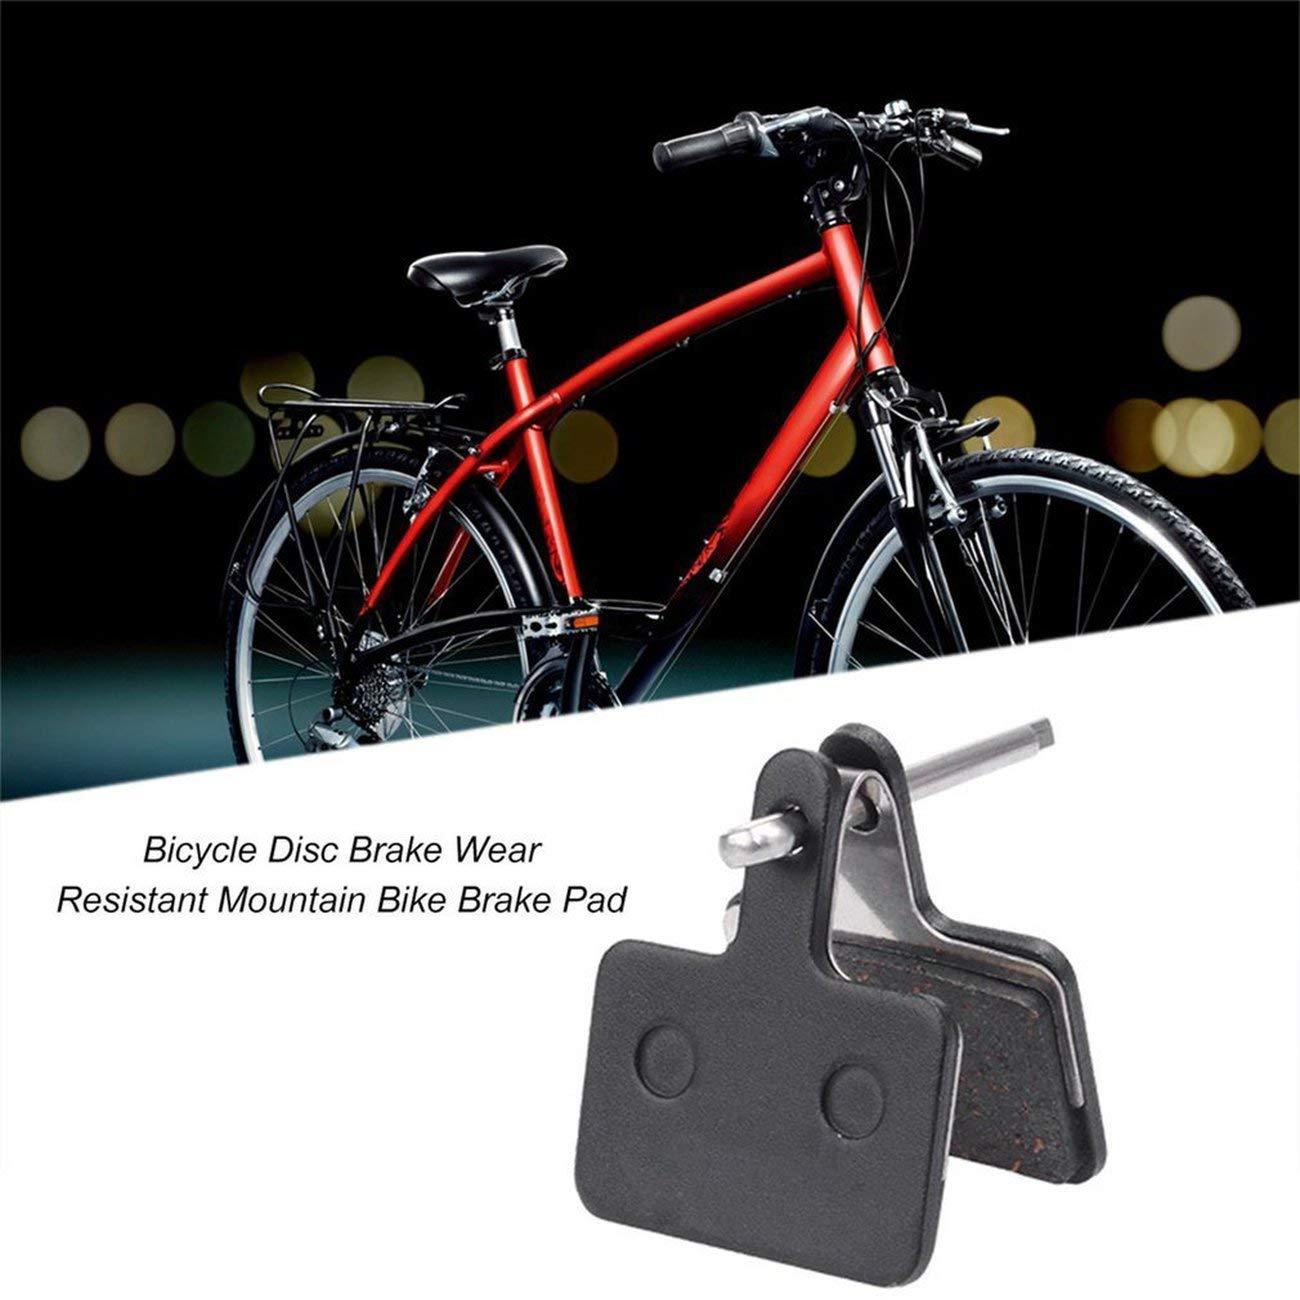 Negro Freno de Disco de Bicicleta Profesional Resistente al Desgaste de Poco Ruido Zapata de Freno de Bicicleta de monta/ña Adecuada para Shimano M355 M415